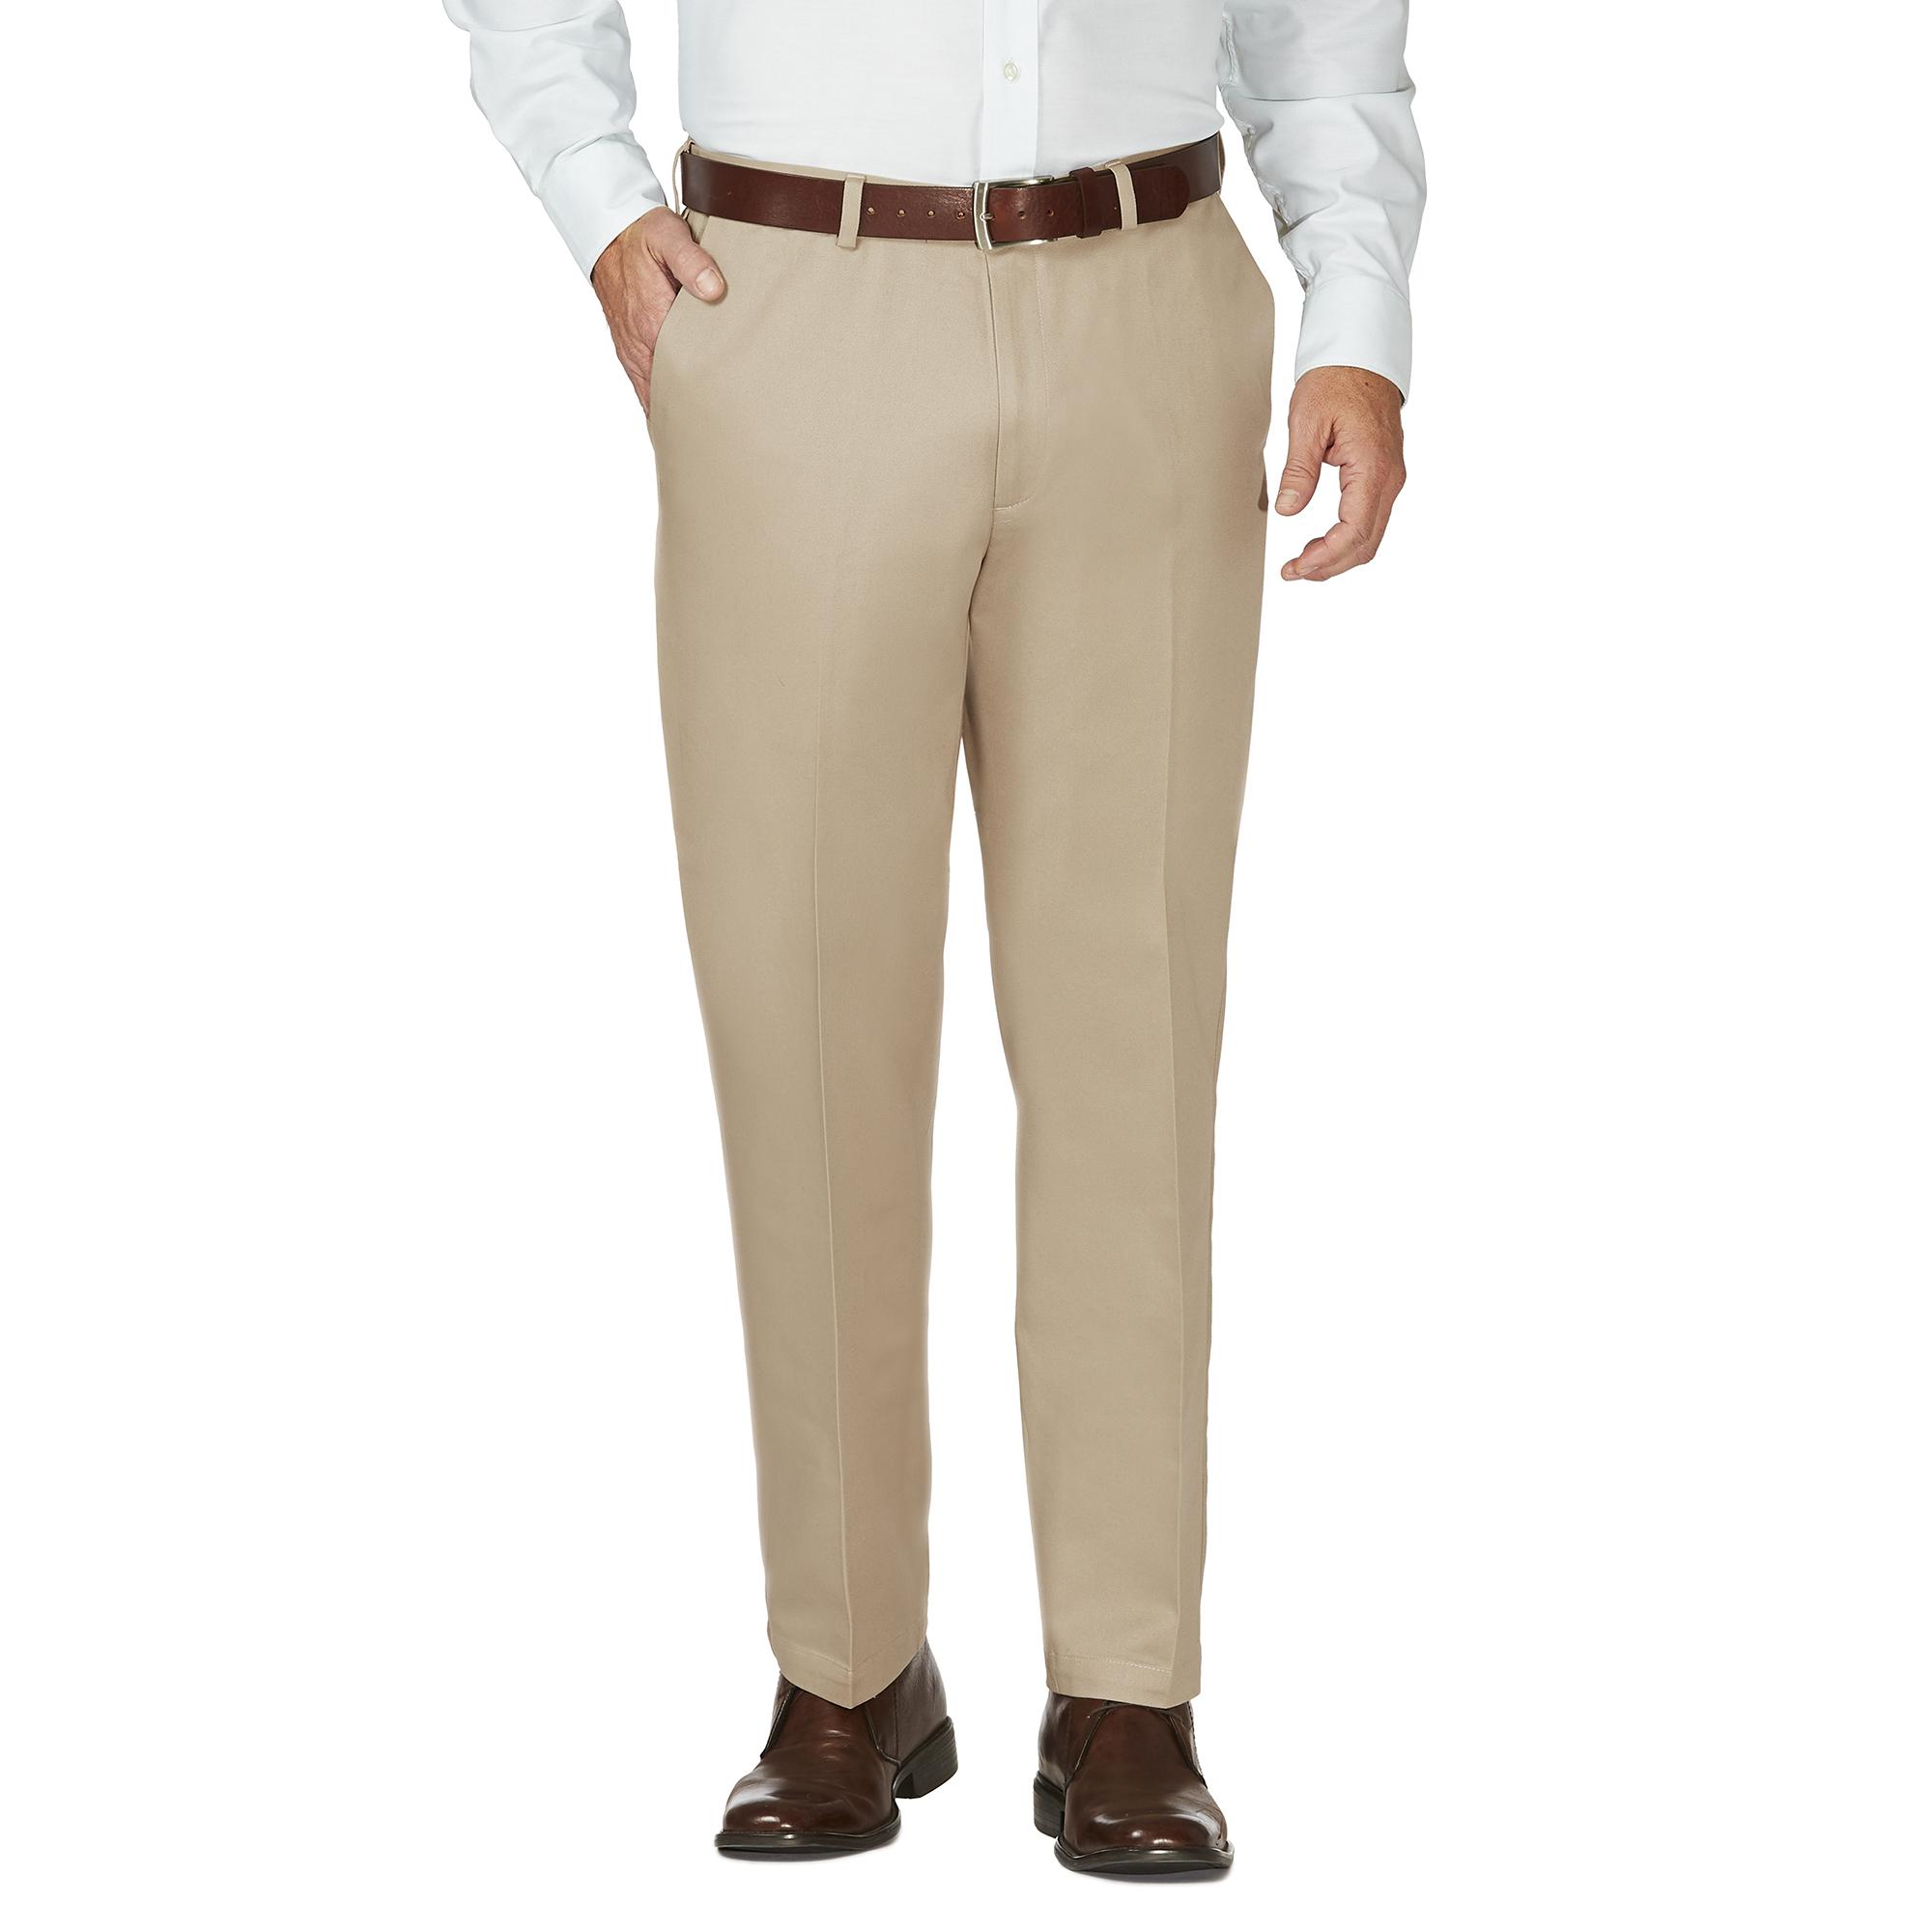 cargo weight back two c front comfort tropic dqpsuxp jeans mens pants men s pockets quarter waist comforter flap and